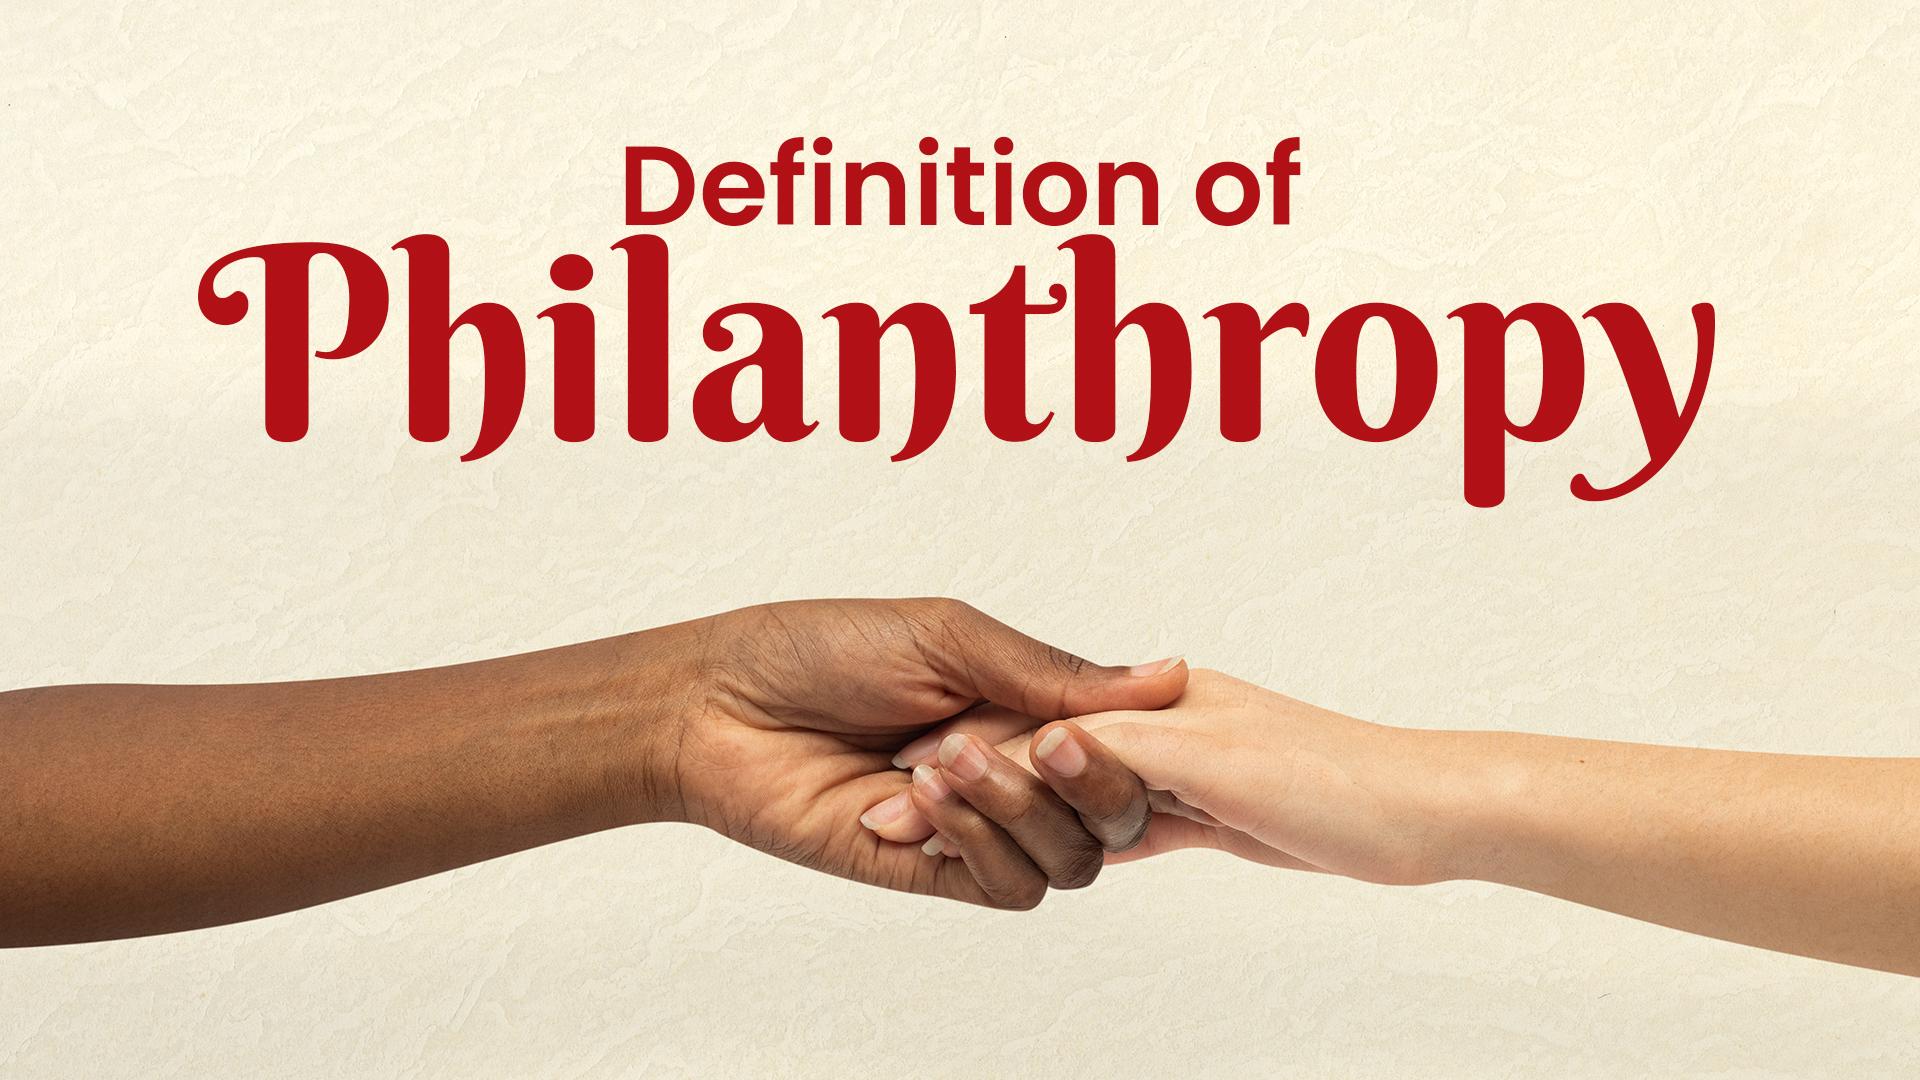 Definition of Philanthropy